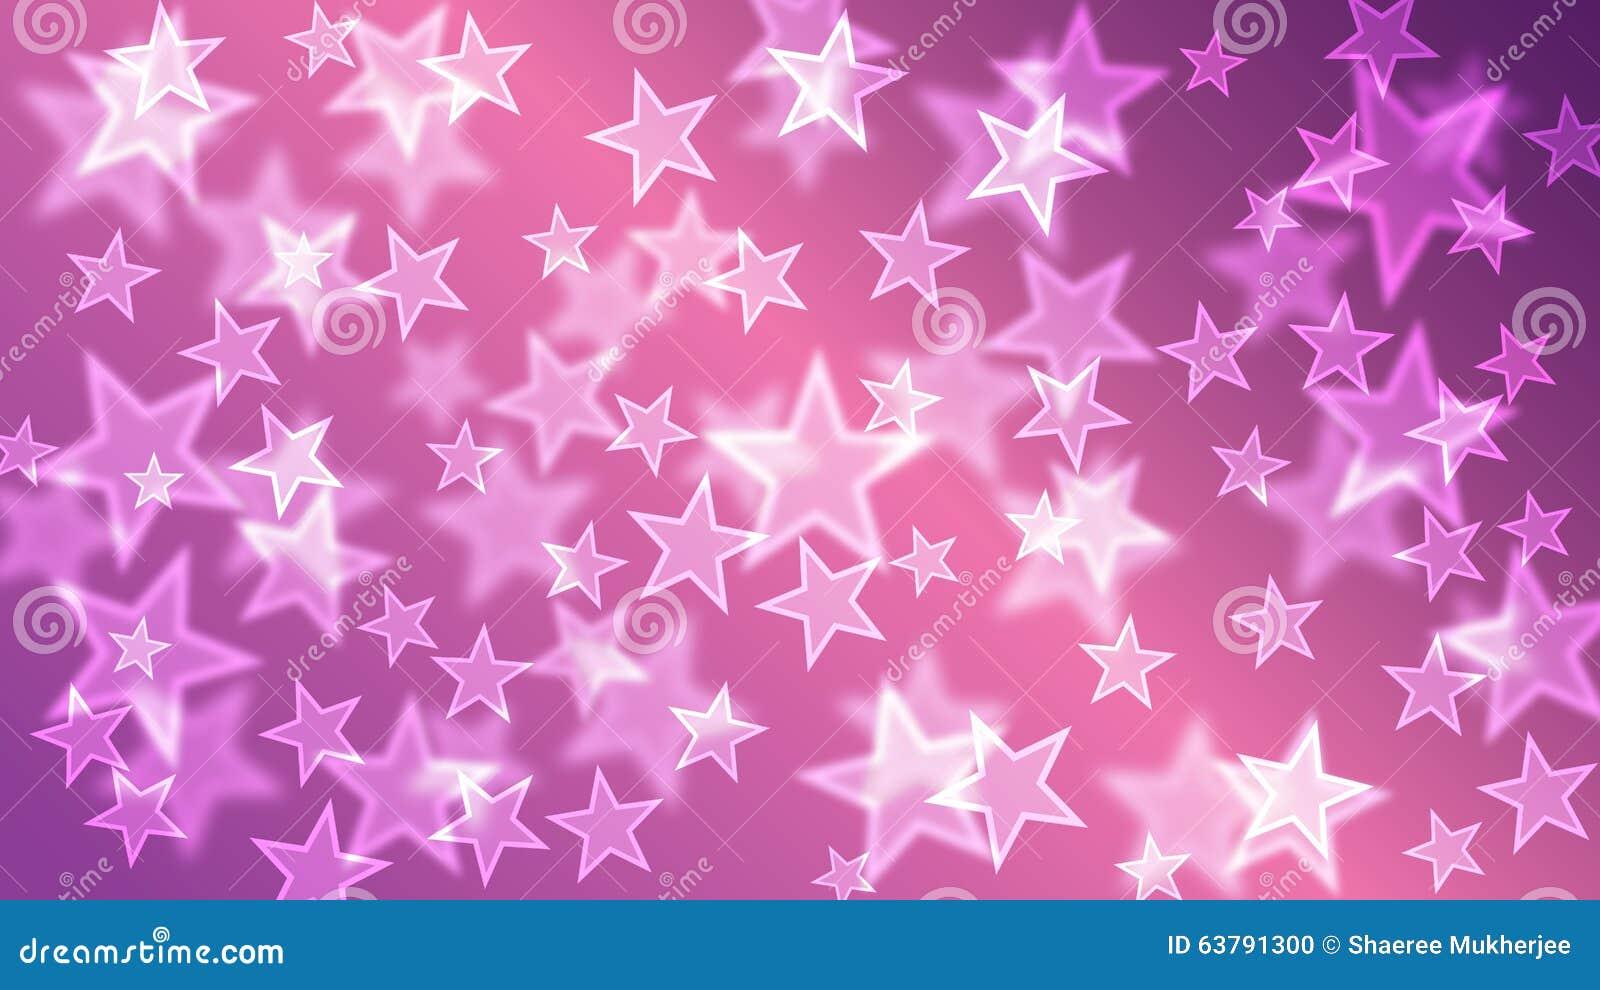 Purple stars bokeh background wallpaper stock illustration purple stars bokeh background wallpaper altavistaventures Images